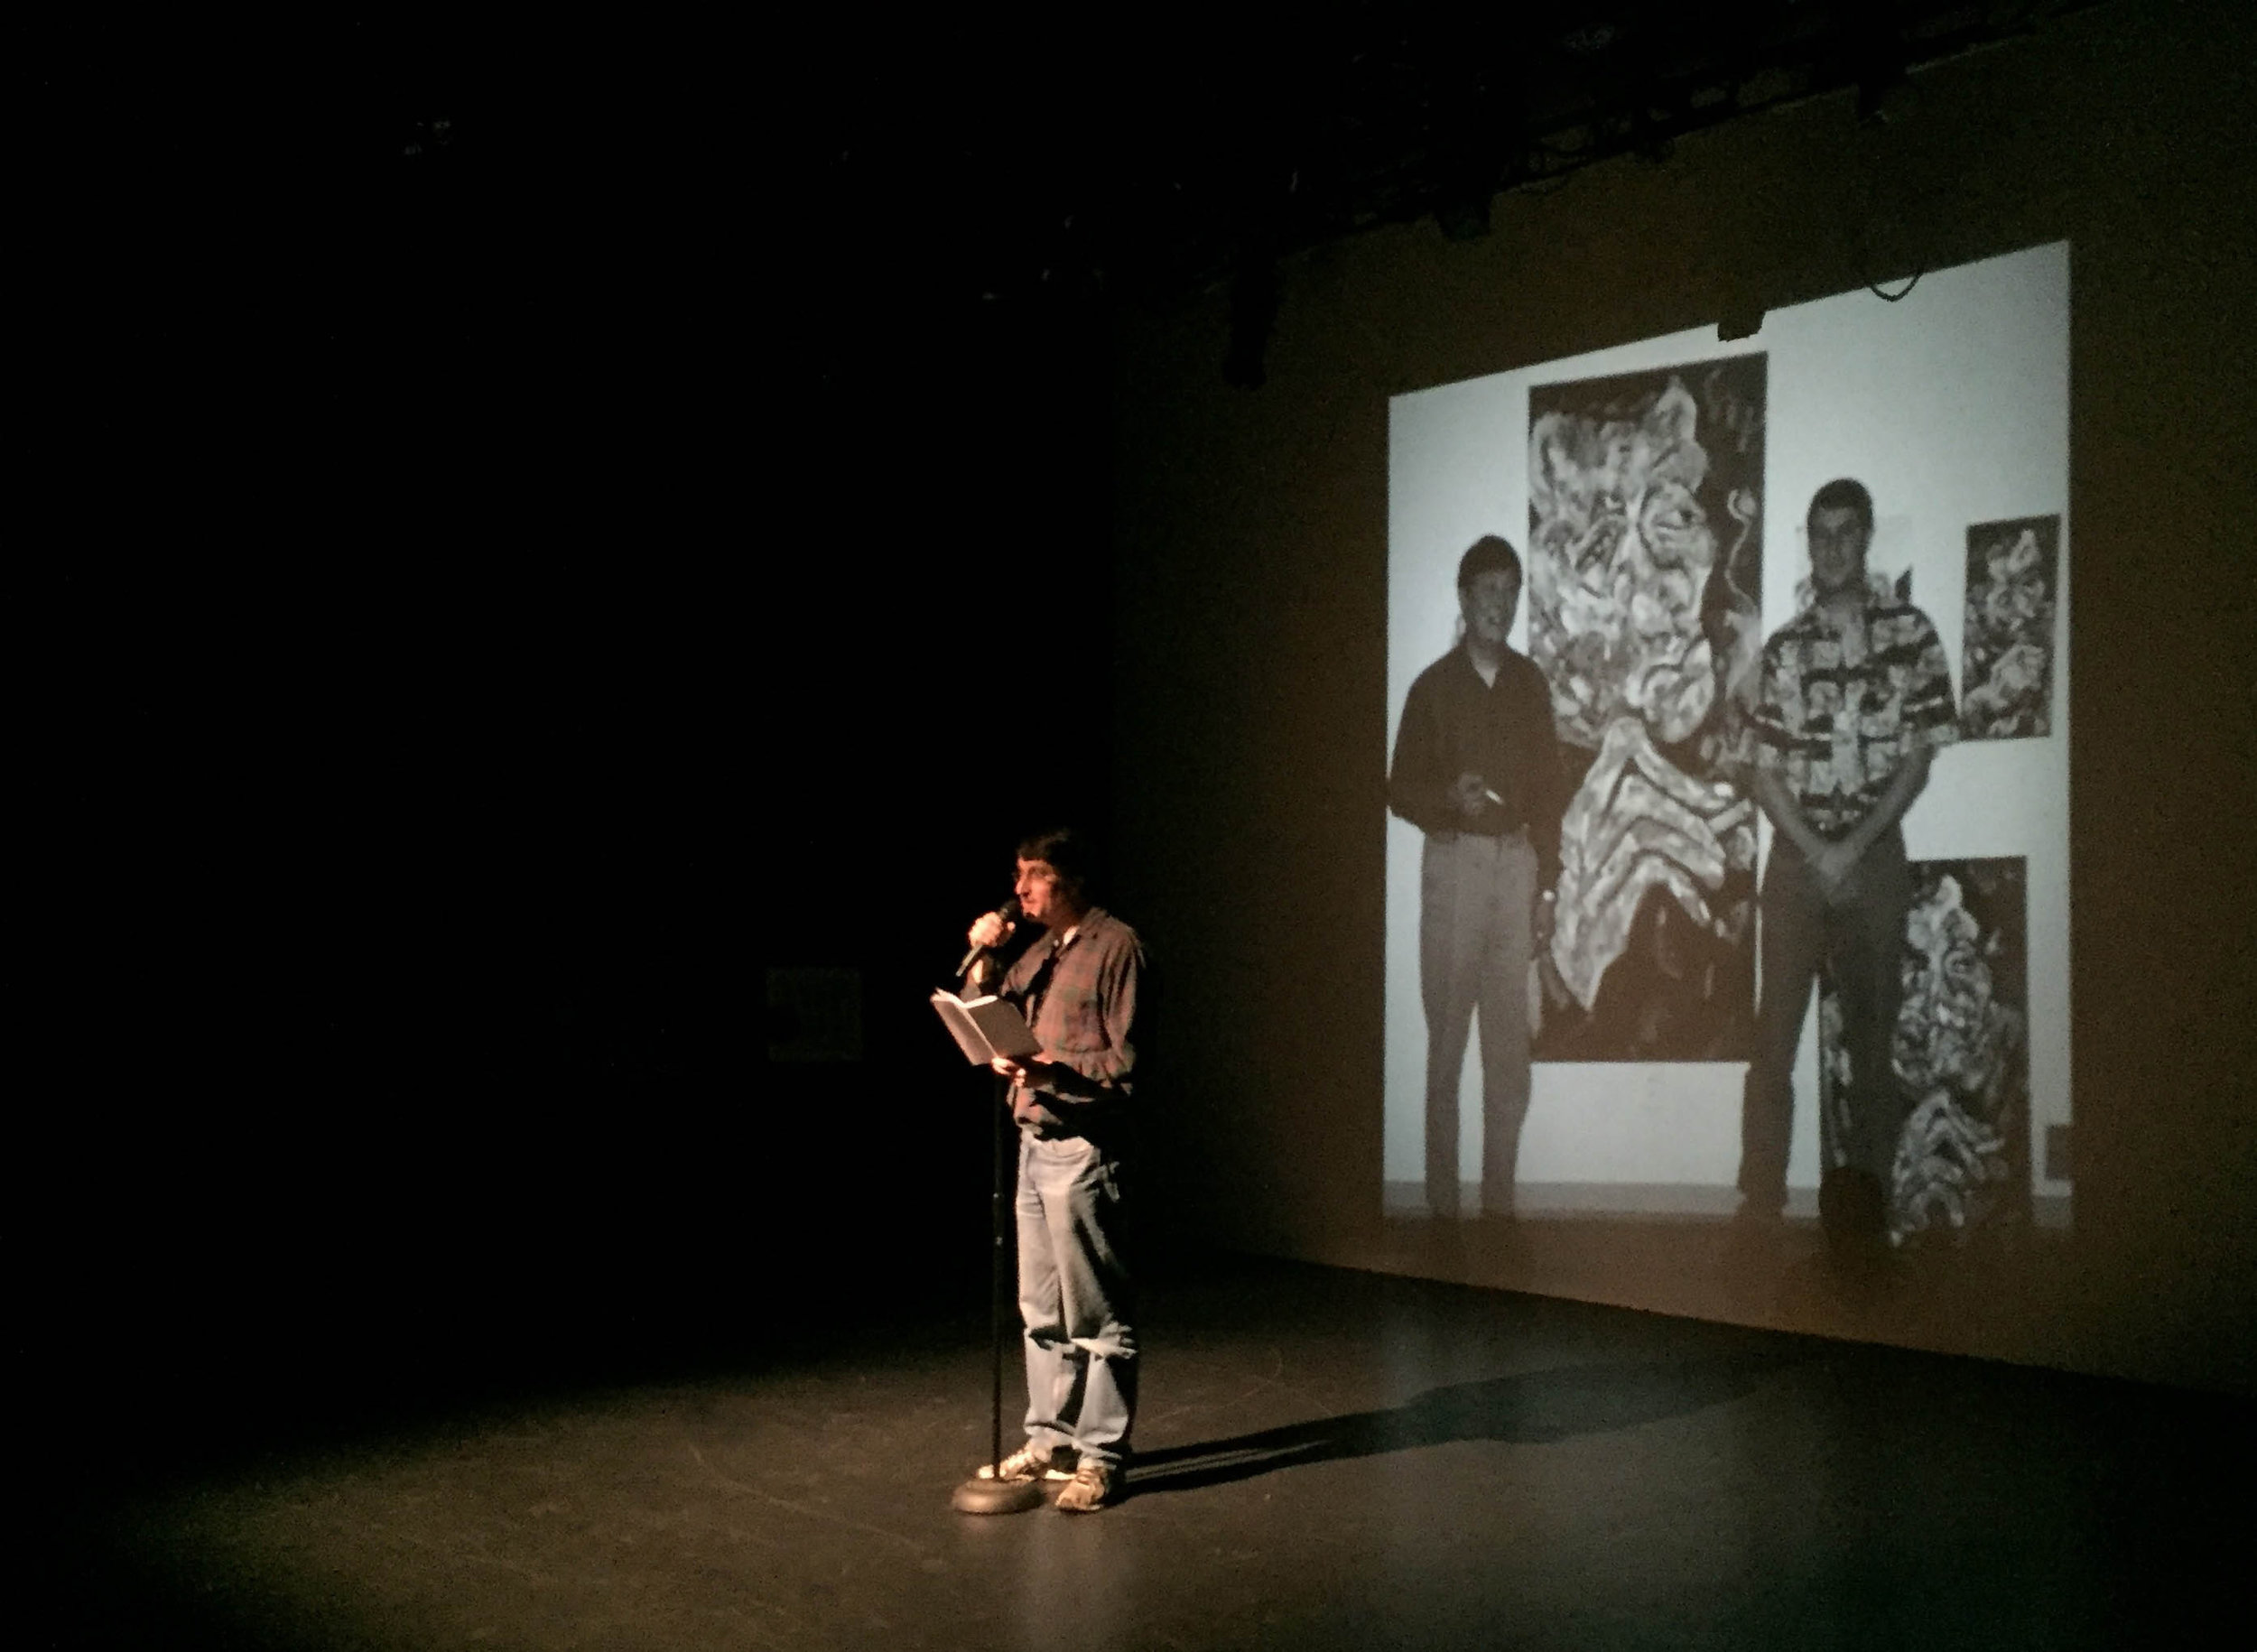 Photo of Tom Block at the 2017 IHRAF by Elisa Guiterrez